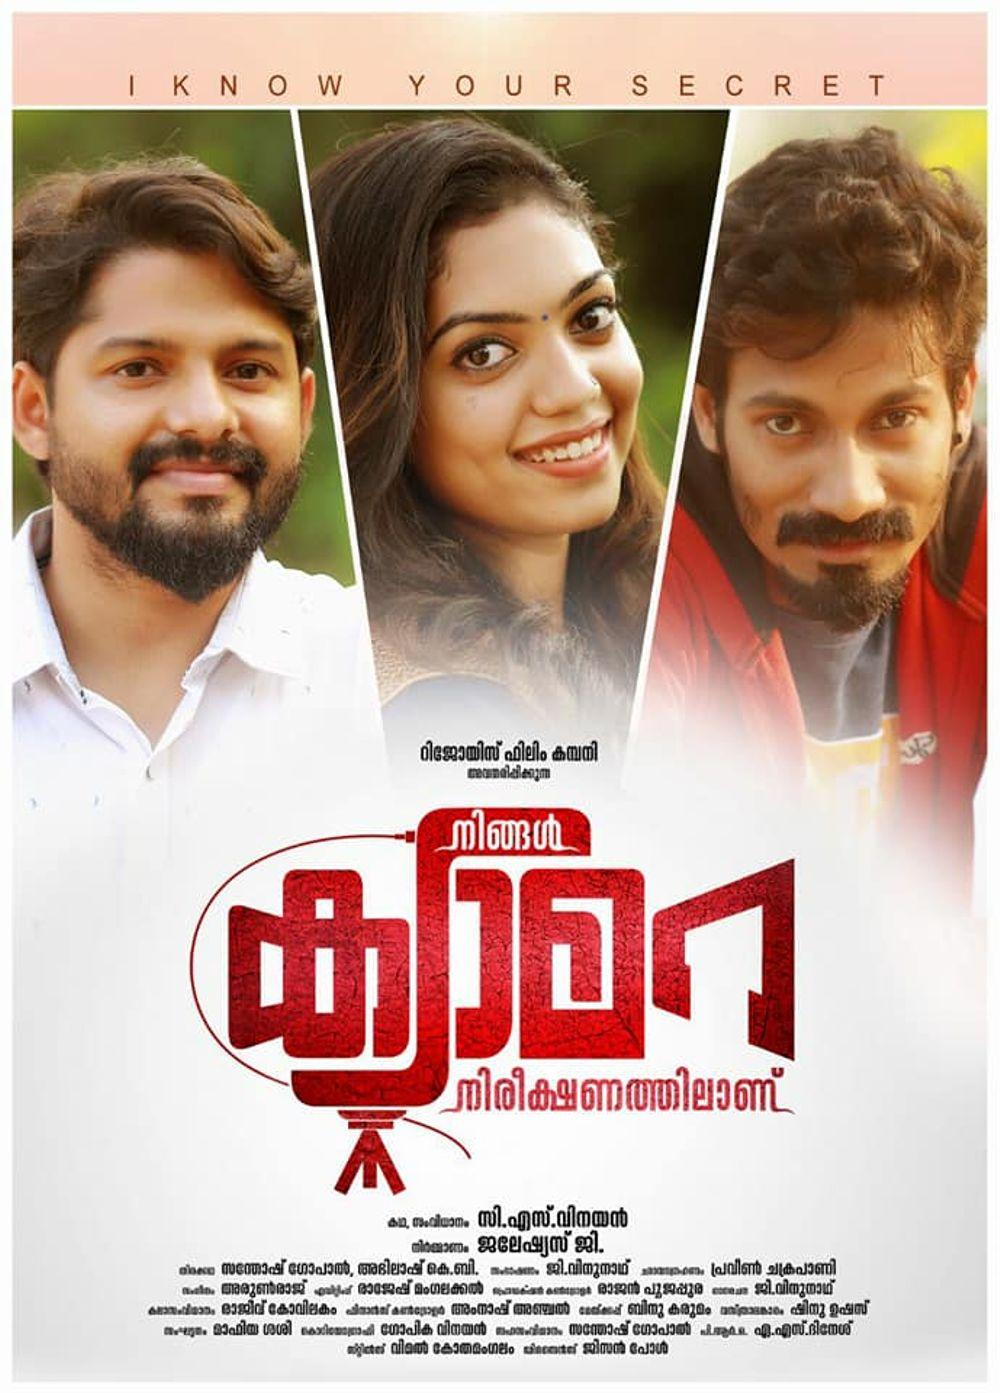 Ningal Camera Nireekshanathilaanu Movie Review